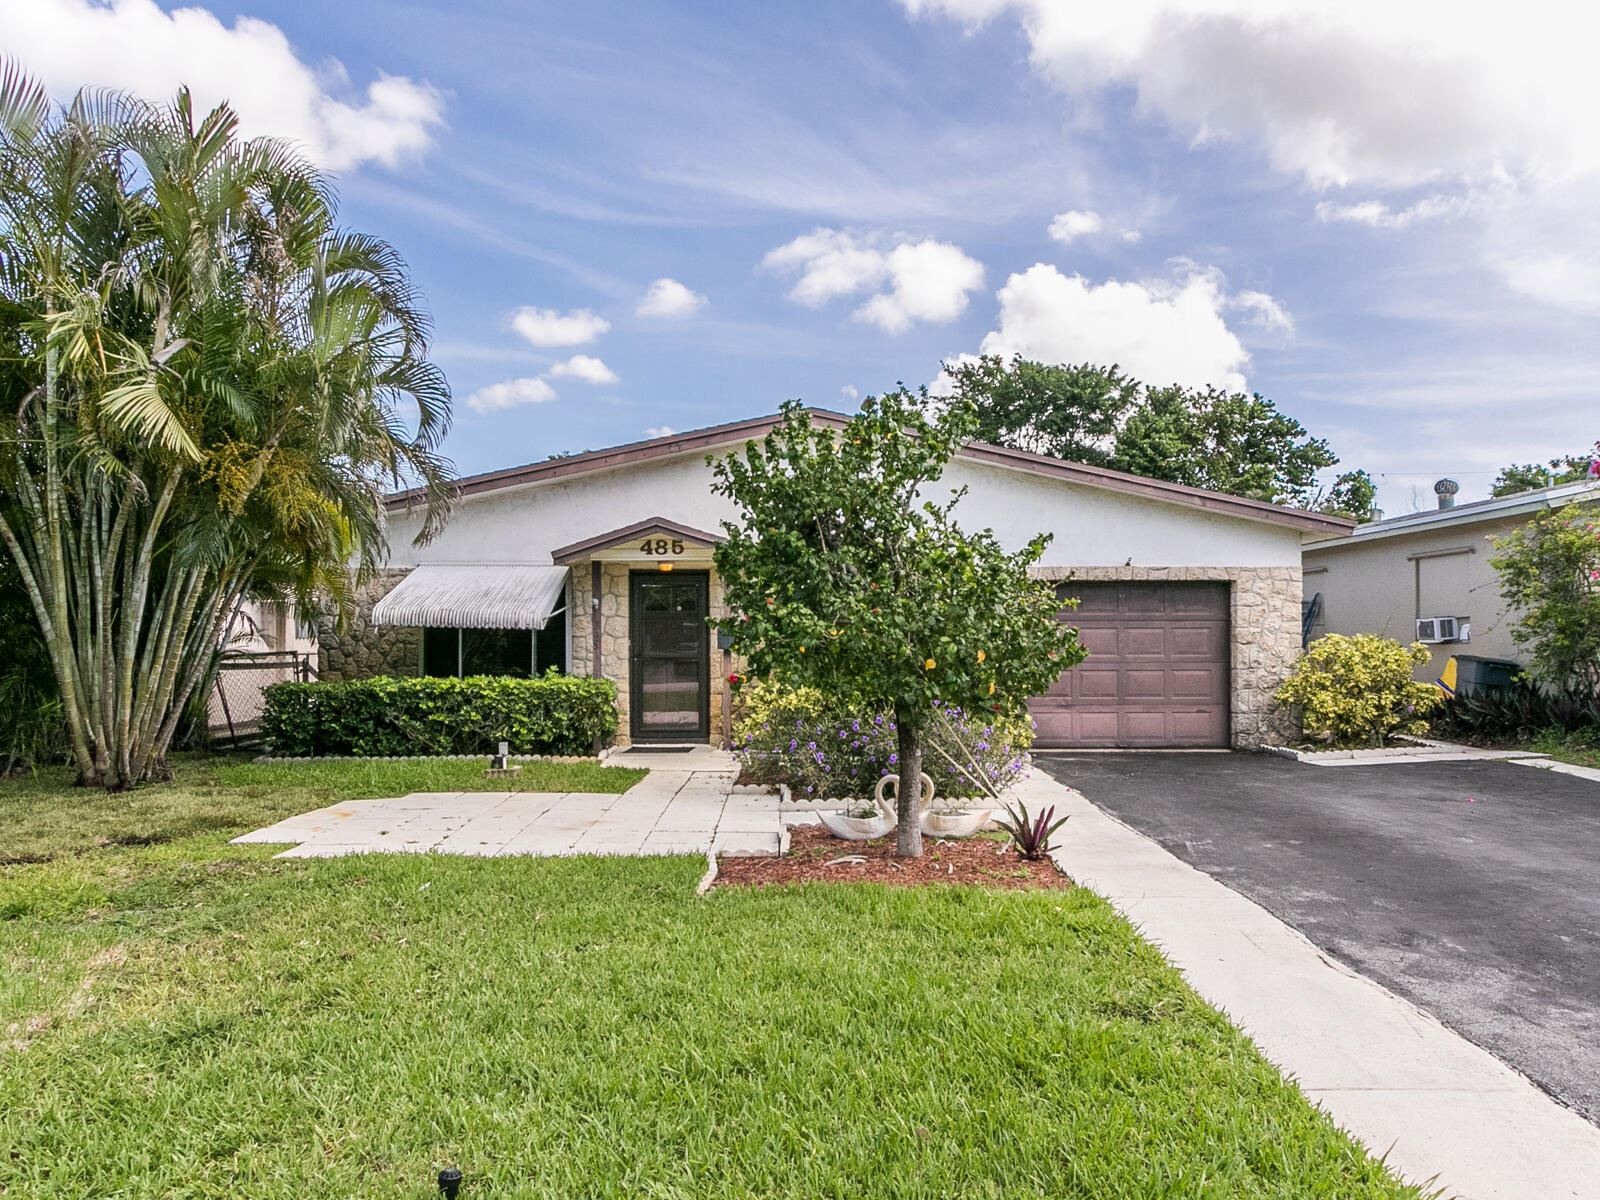 485 SW 1st Street, Boca Raton, FL 33432 - #: RX-10734422